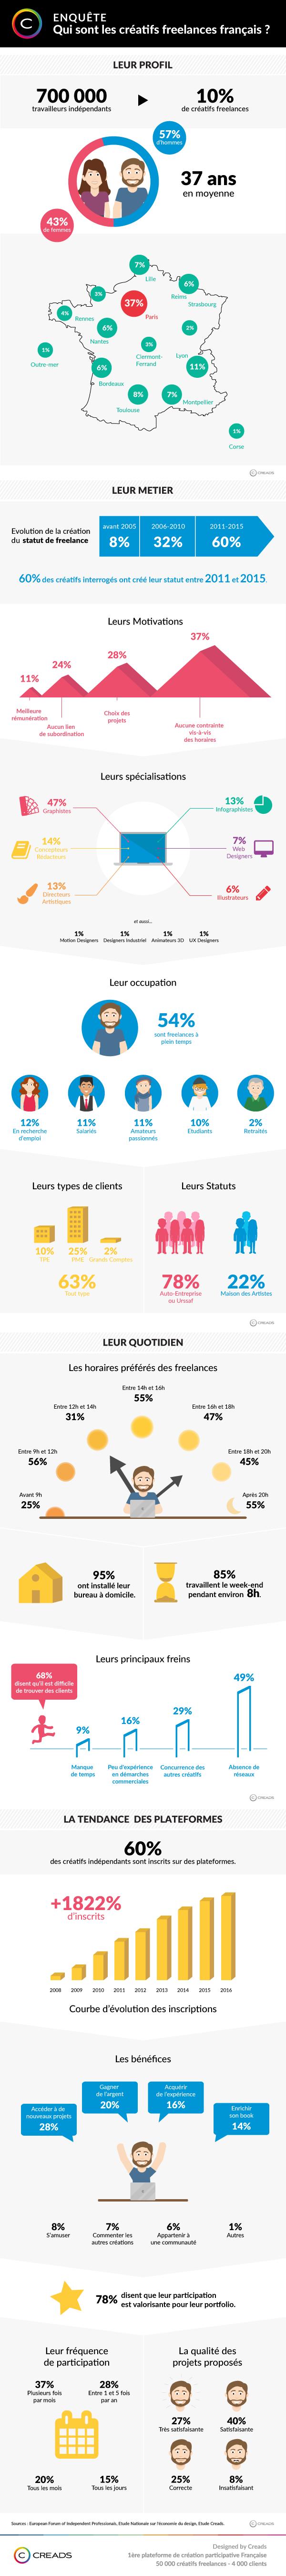 creads_infographiefreelances